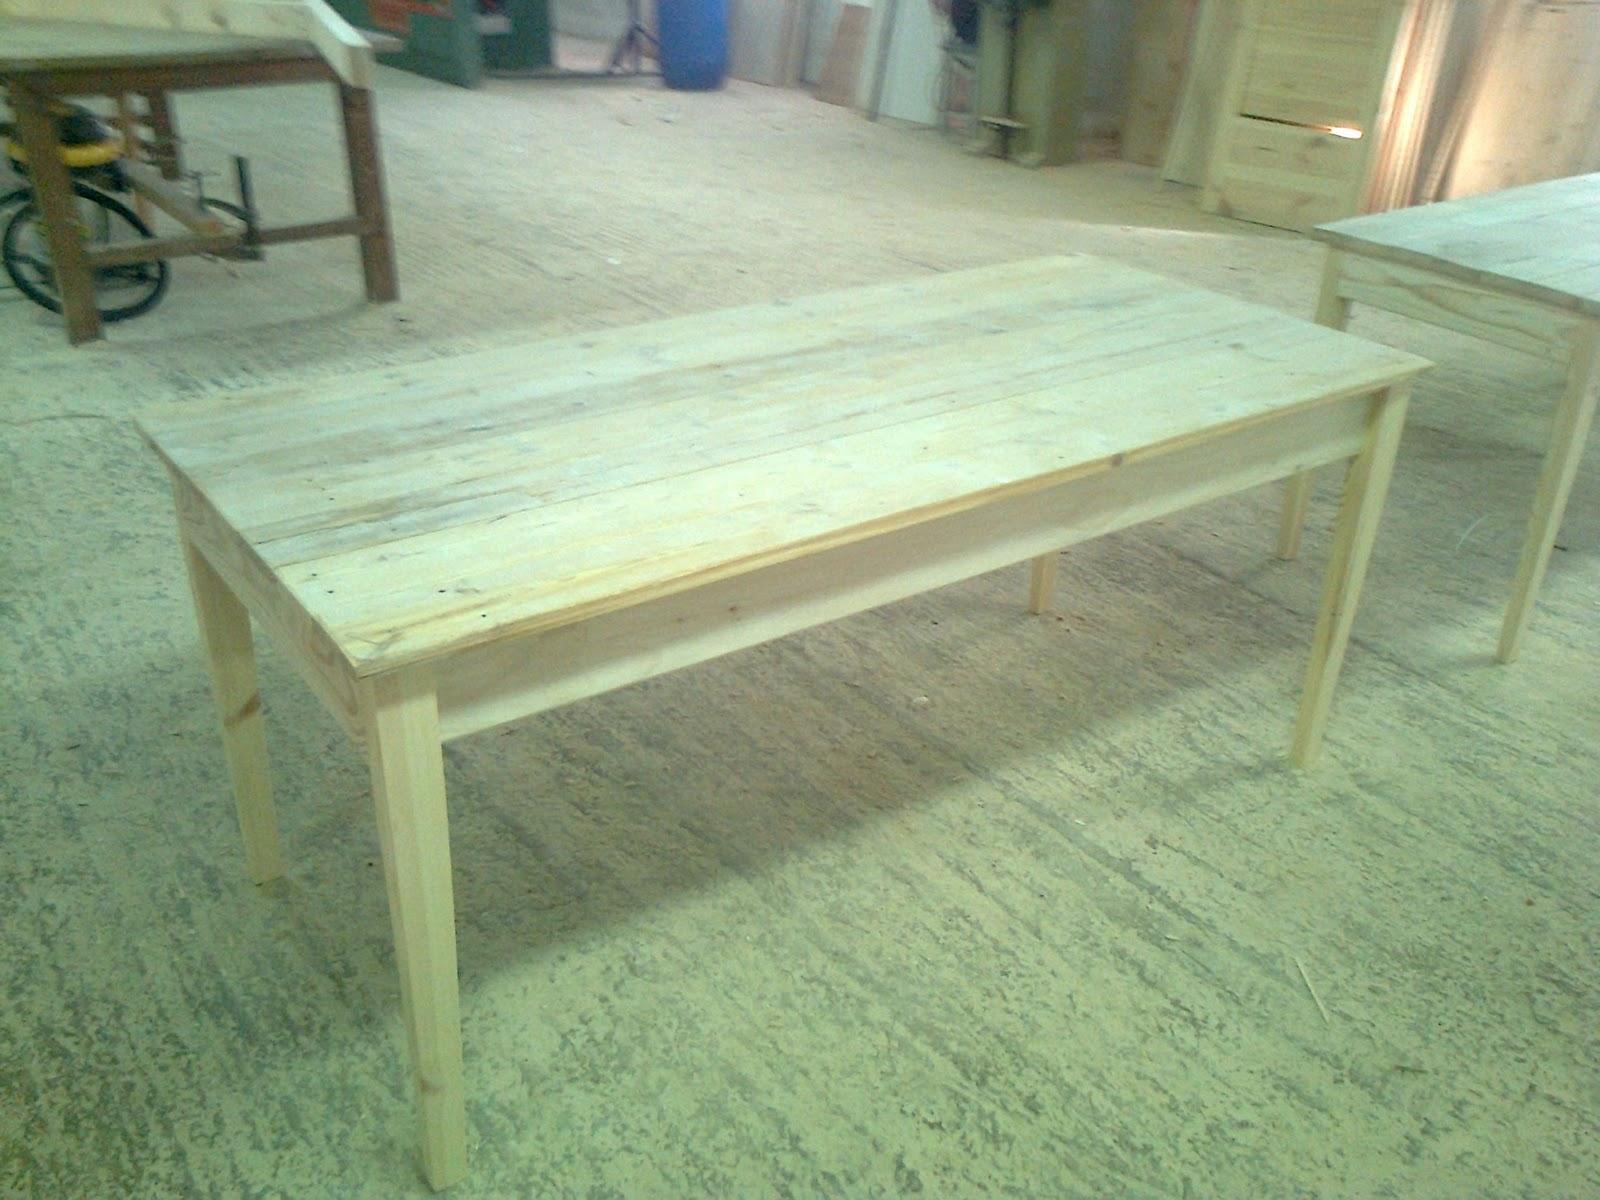 Mi las mobles taula r stica a mida per pintar mesa r stica para pintar mesas madera reciclada - Mobles vintage barcelona ...